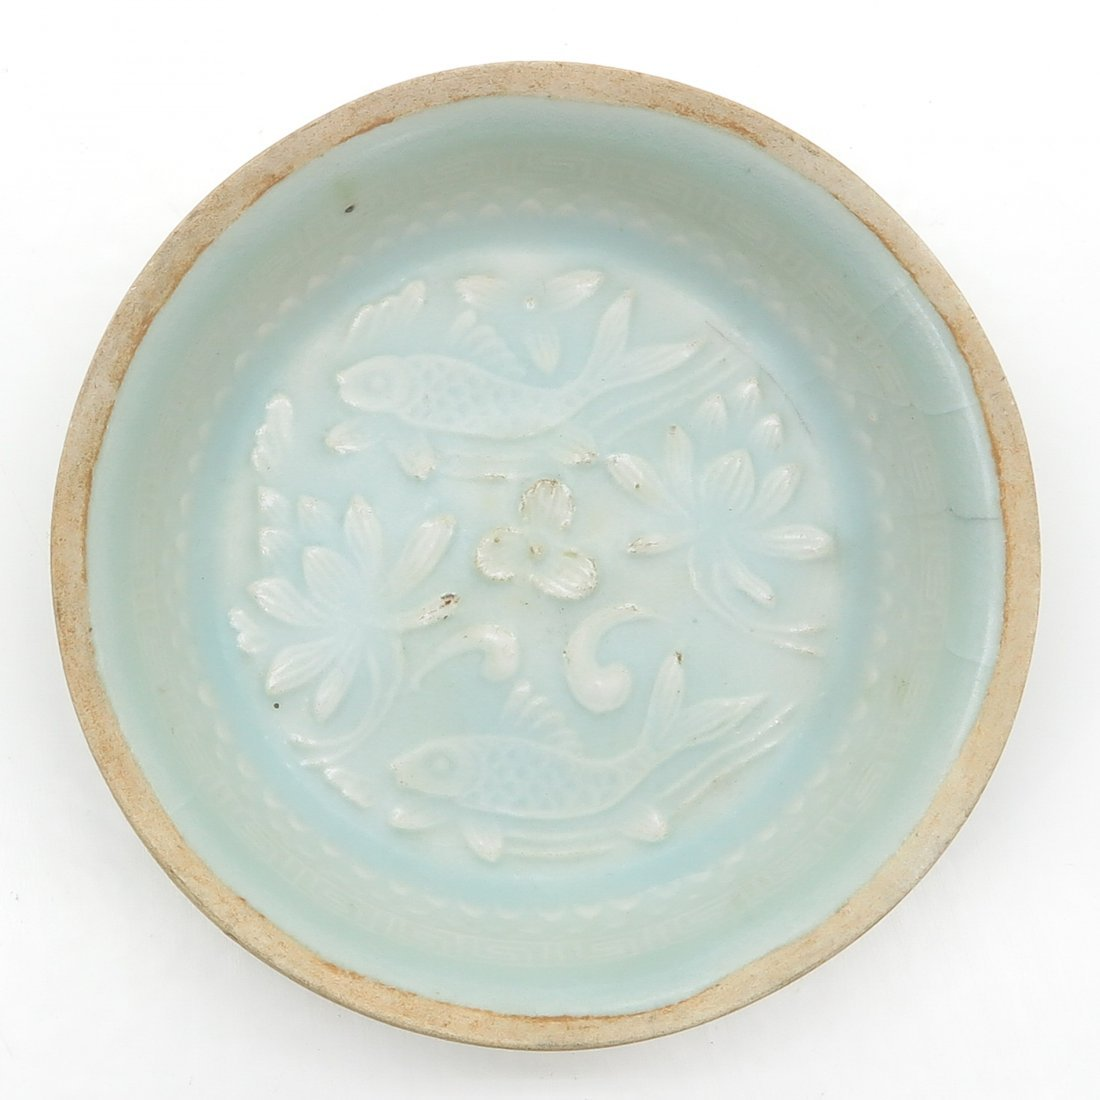 China Porcelain Song Dynasty Celadon Decor Dish